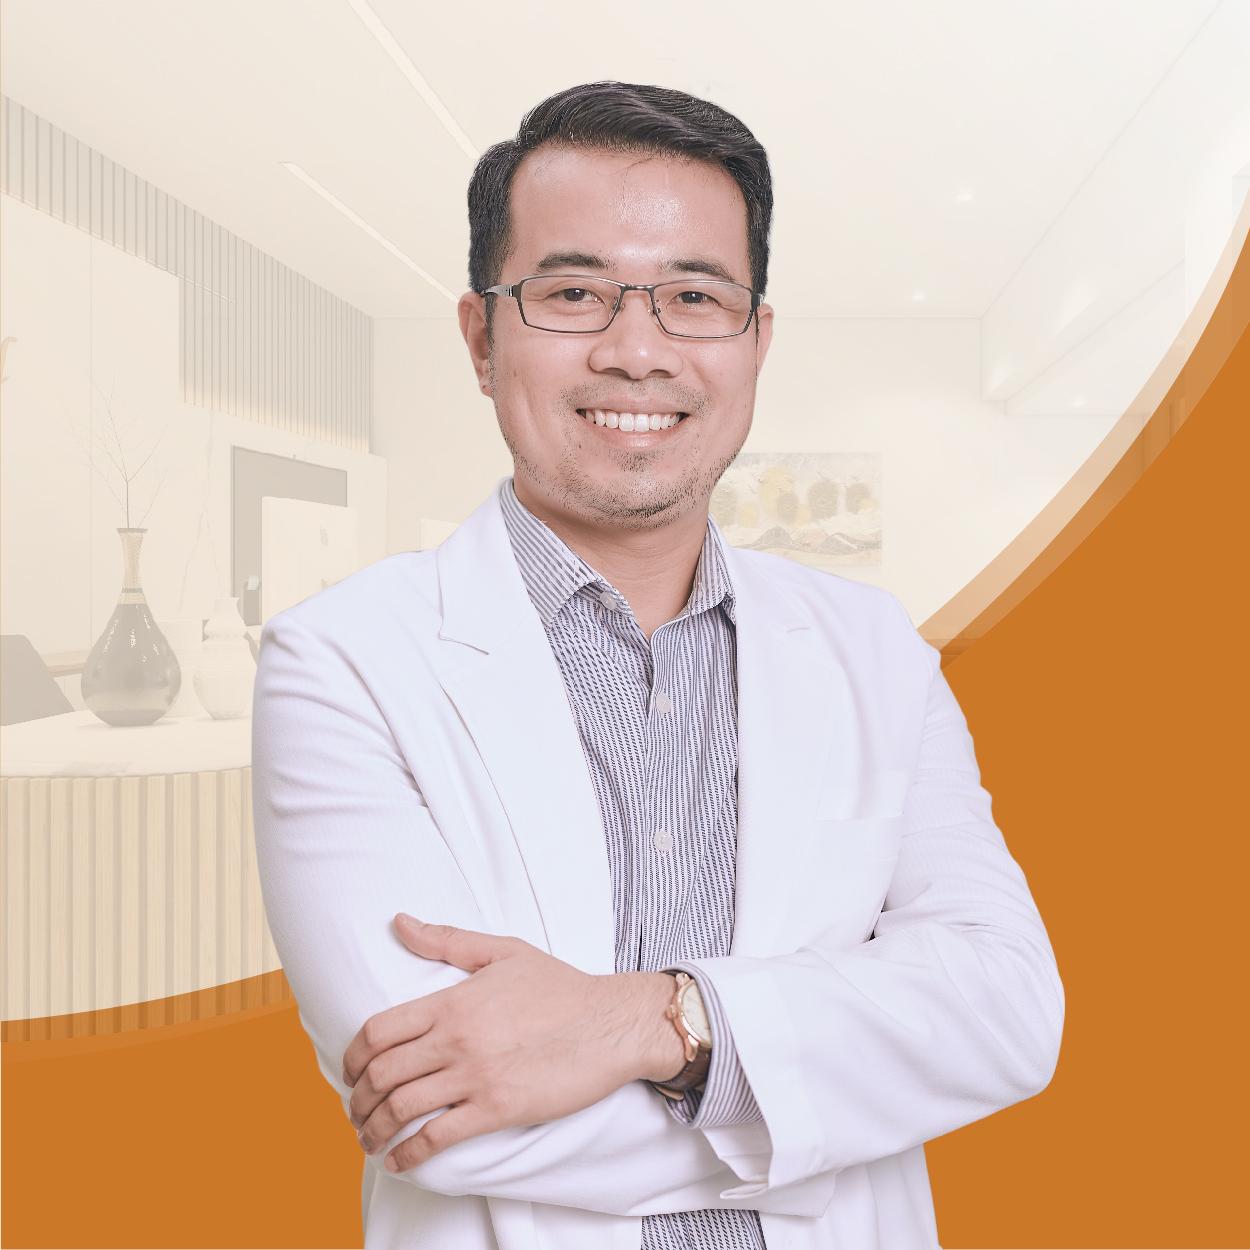 <strong>DR. HOÀNG HIẾU</strong>